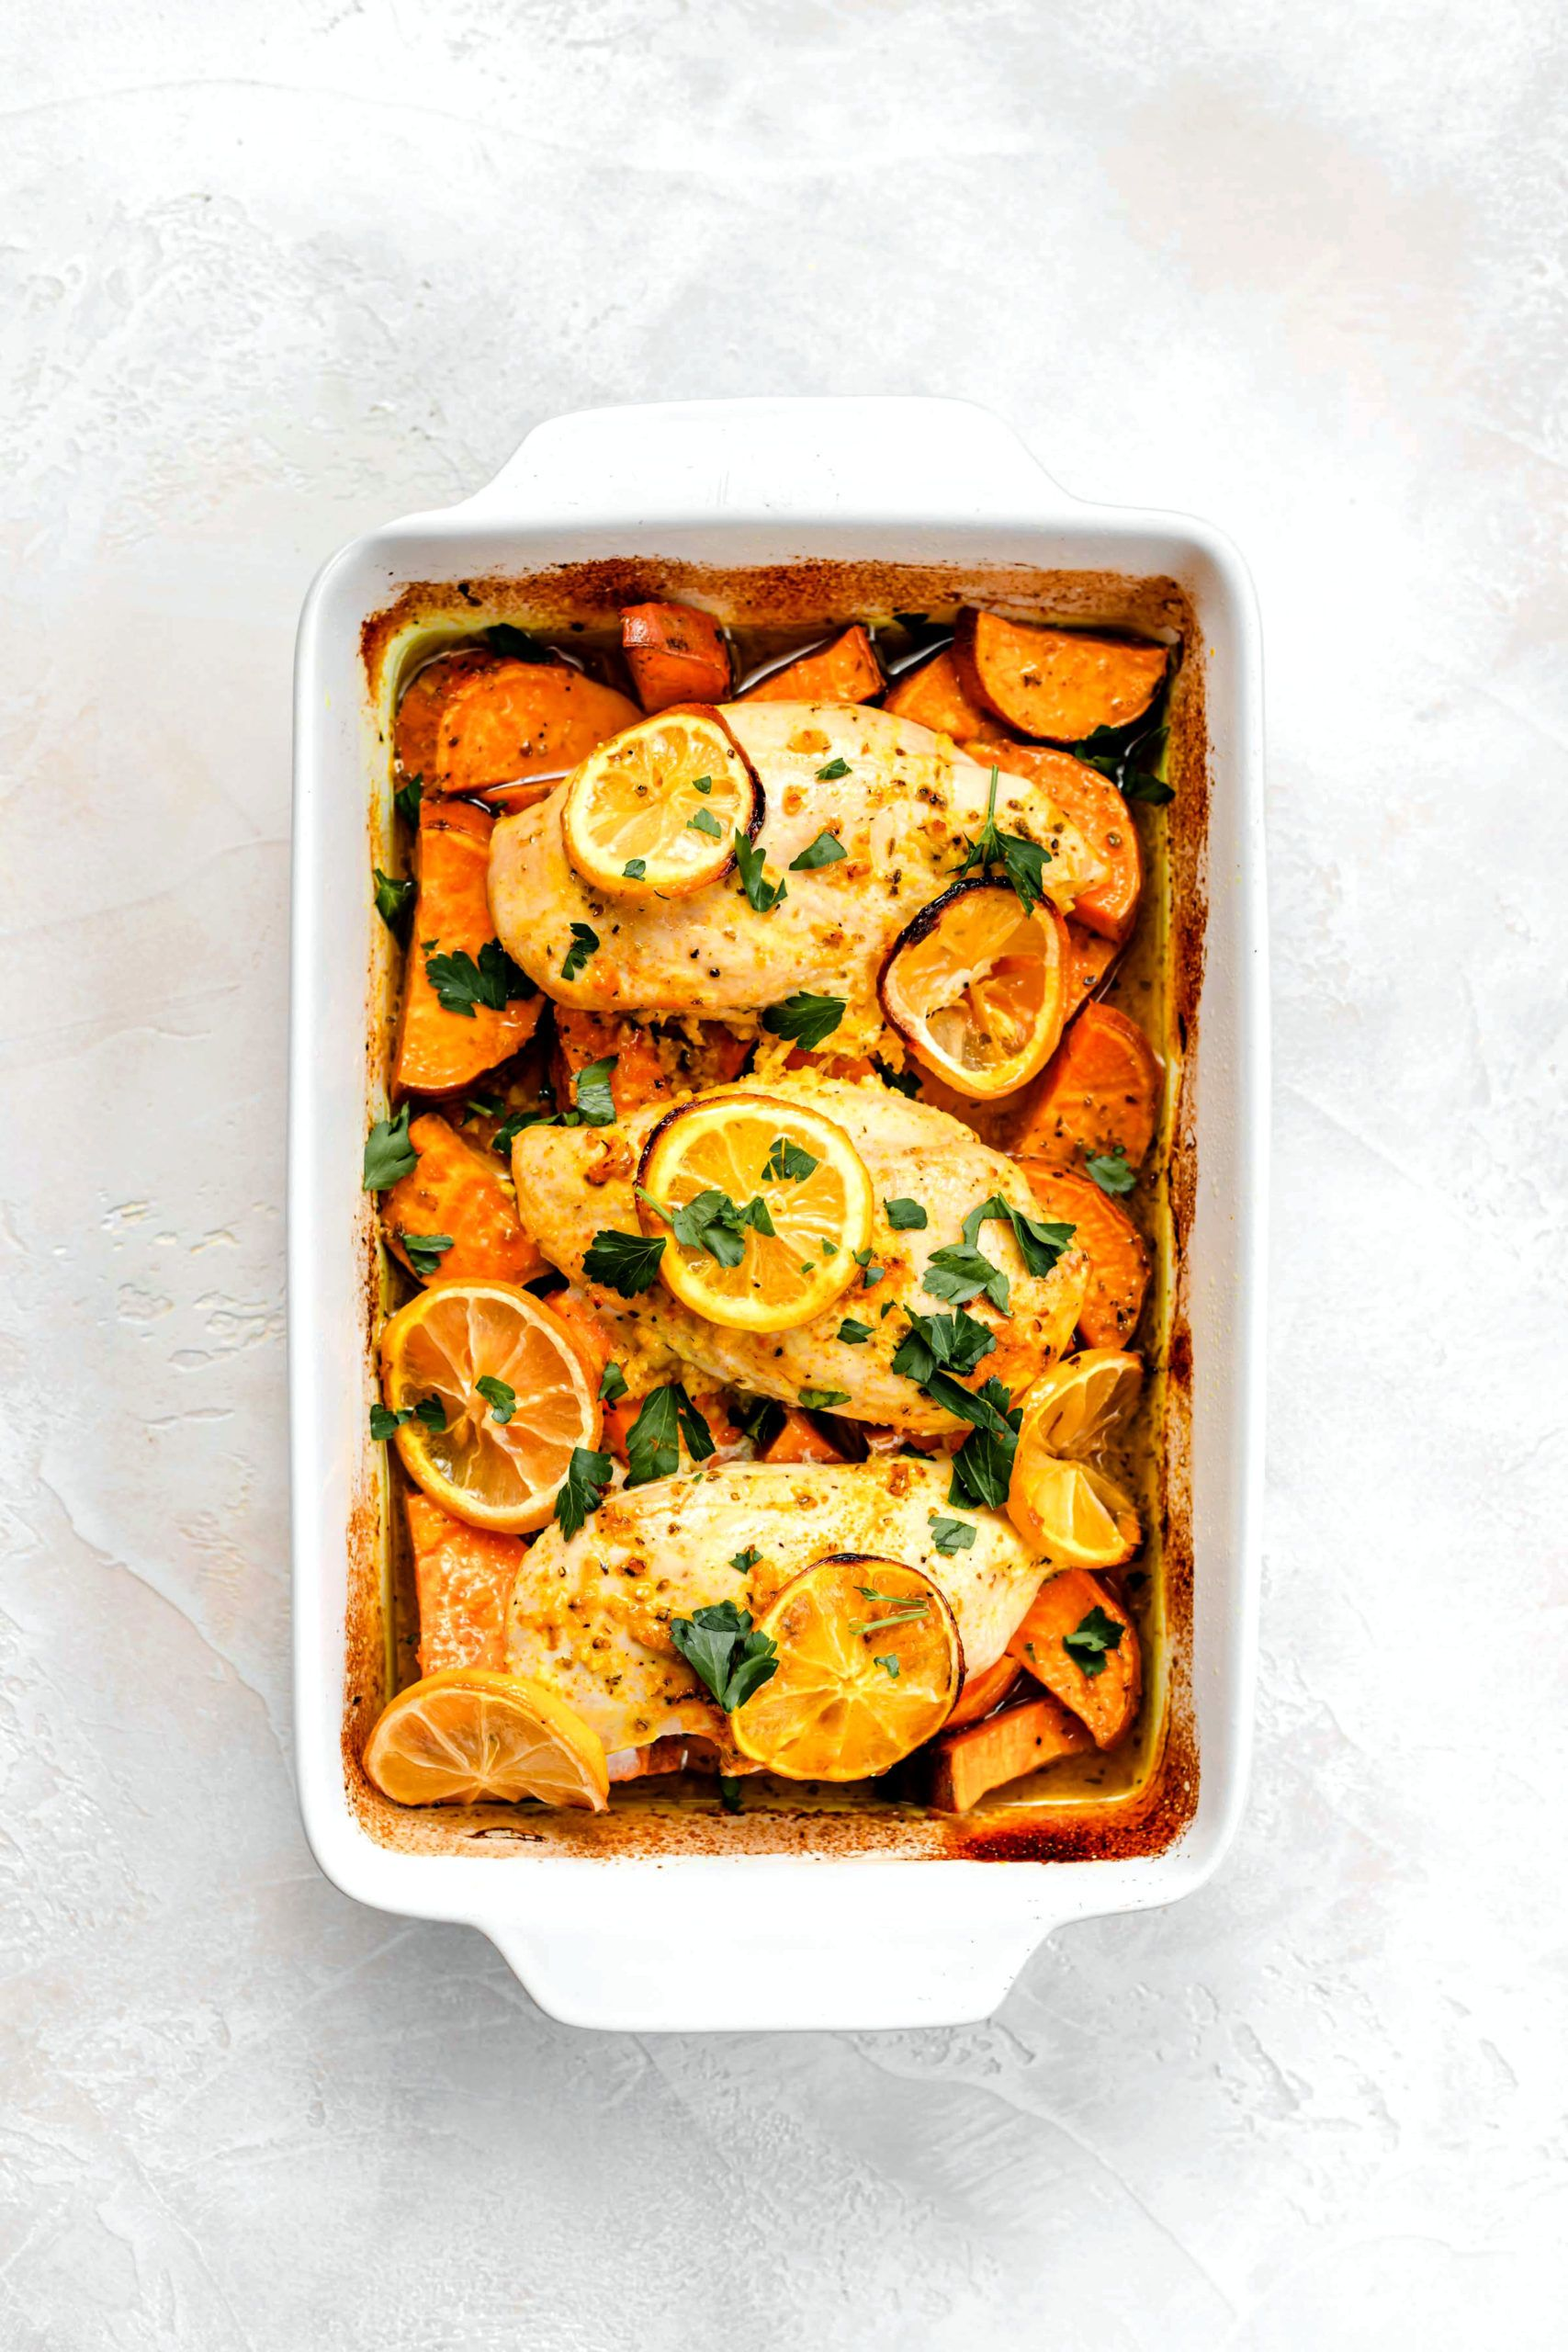 Healthy Lemon Chicken And Sweet Potatoes Paleo Whole 30 Baked Ambrosia Recipe In 2020 Healthy Lemon Chicken Recipe Healthy Lemon Chicken Paleo Sweet Potato